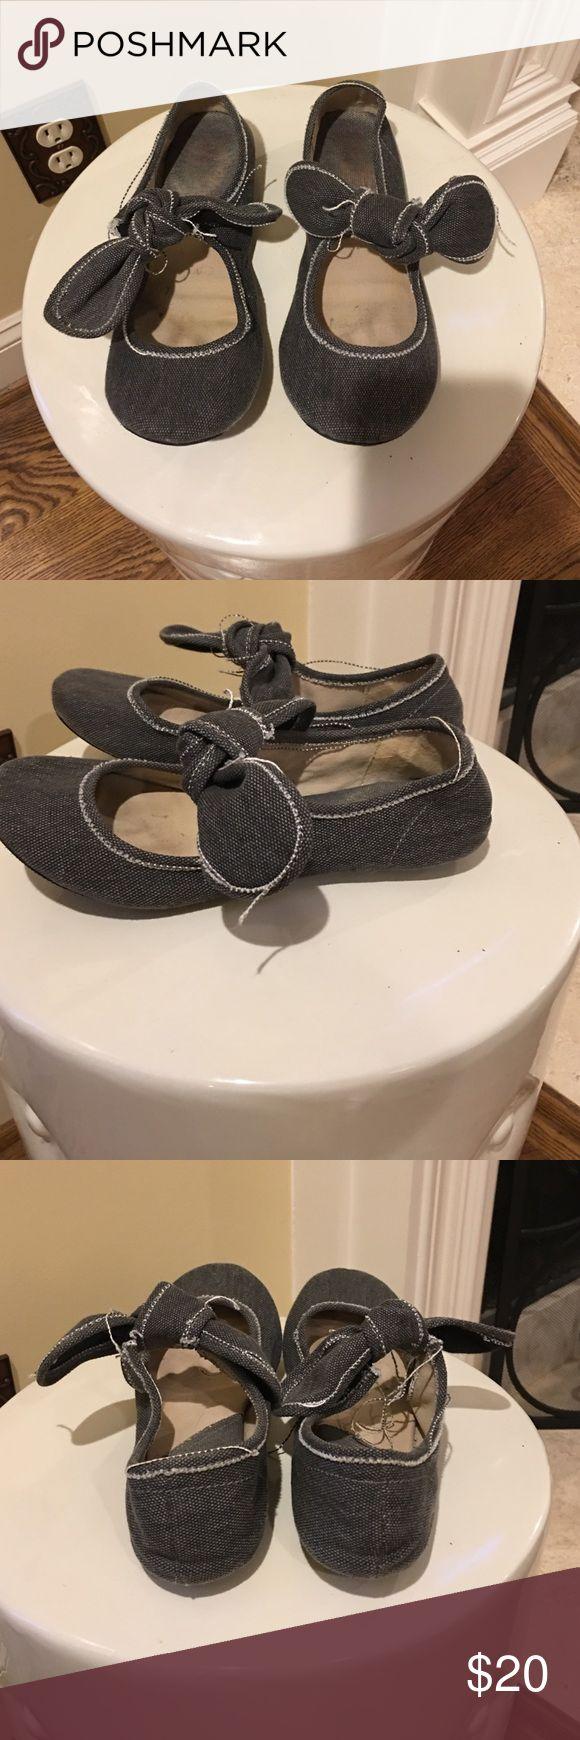 Big Buddha gray Mary Janes Big Buddha gray Mary Janes with white stitching! Super cute! Size 8 Bug Buddha Shoes Flats & Loafers